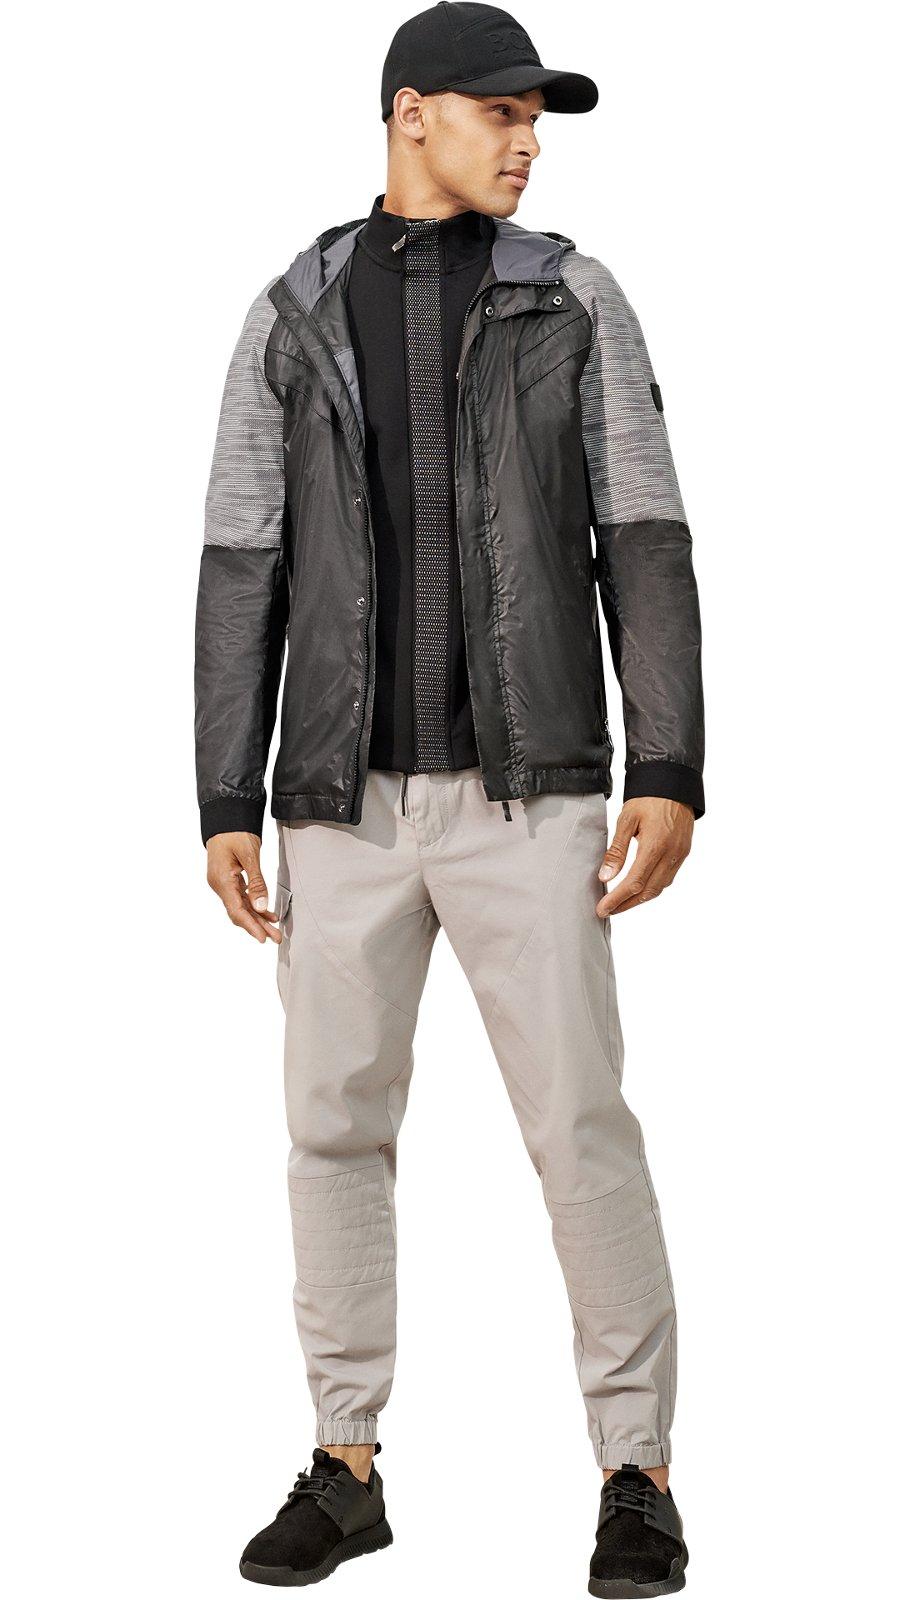 Man in black and grey outerwear, black sweatshirt, grey pants, and black  sneakers ... 7fec53892ae